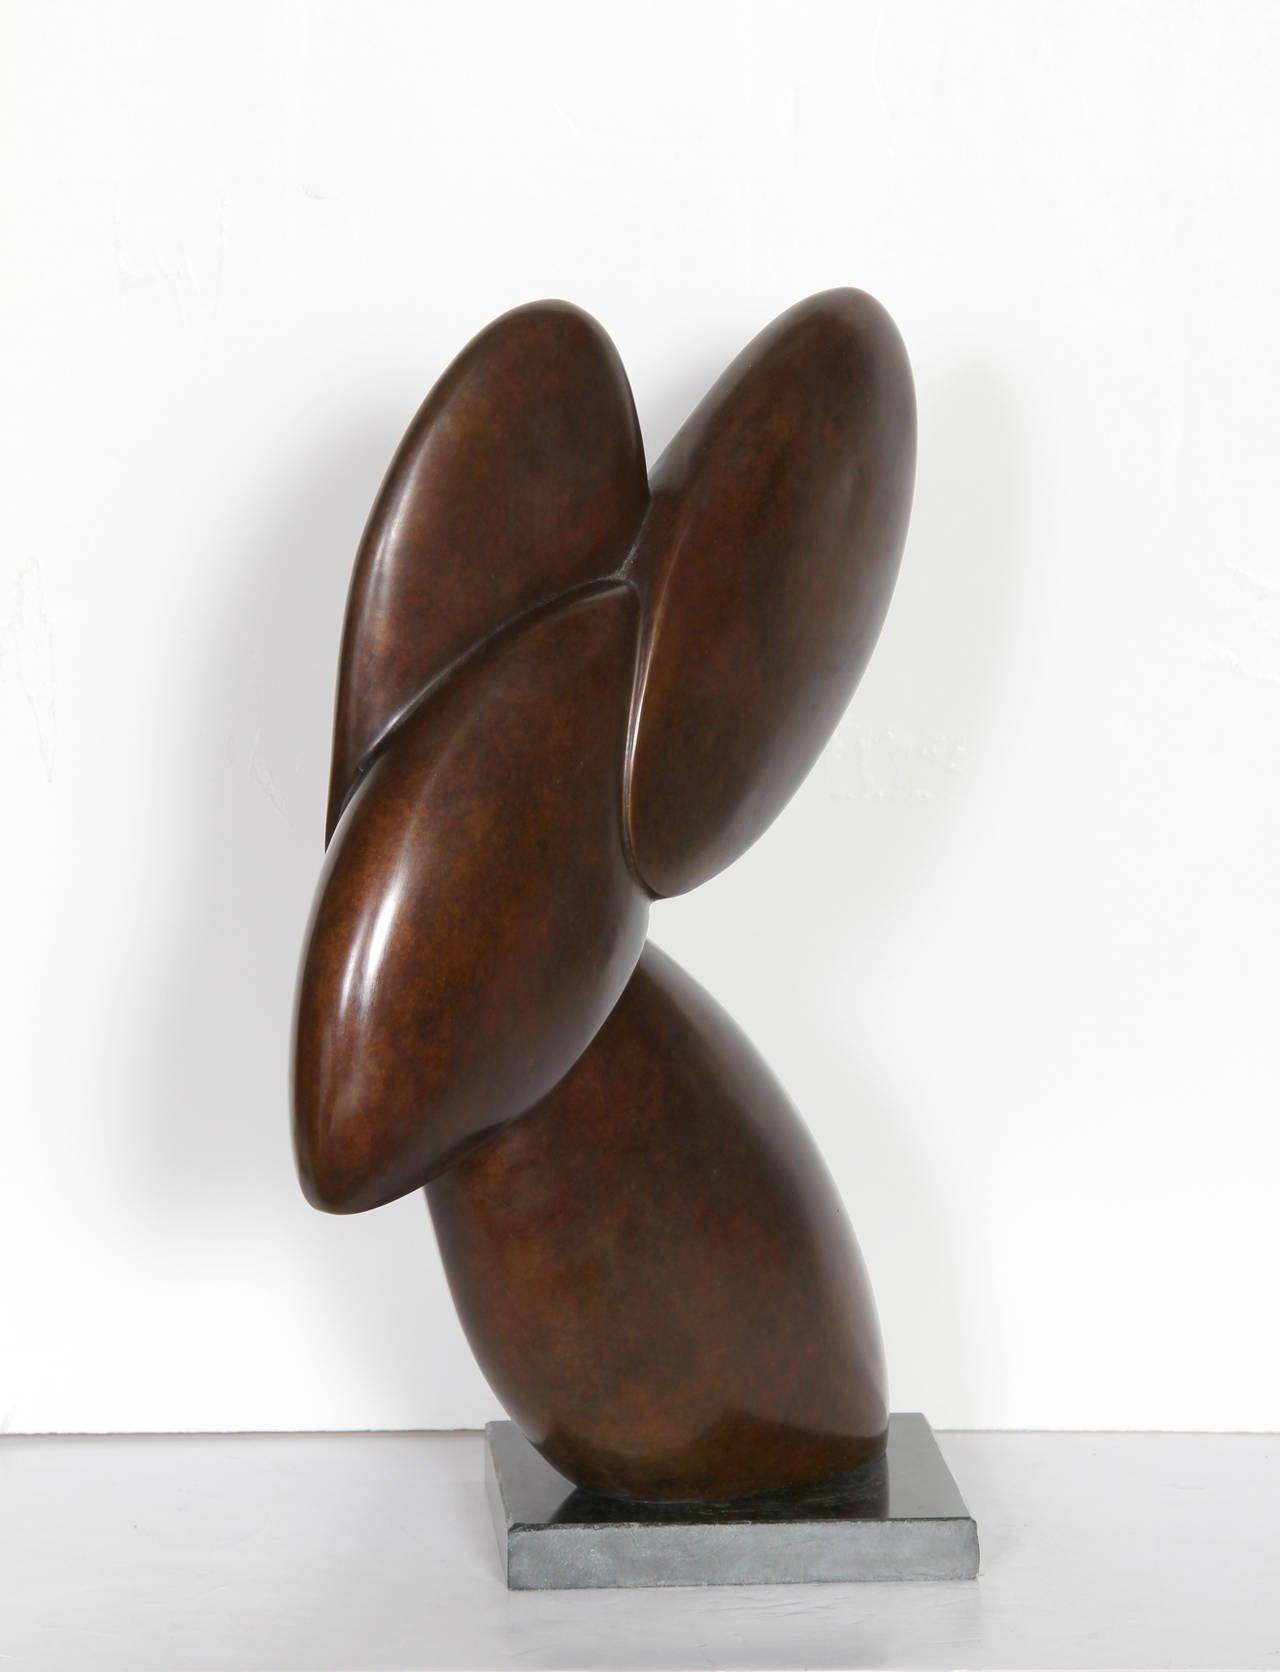 Rabbit - Sculpture by Constantin Antonovici